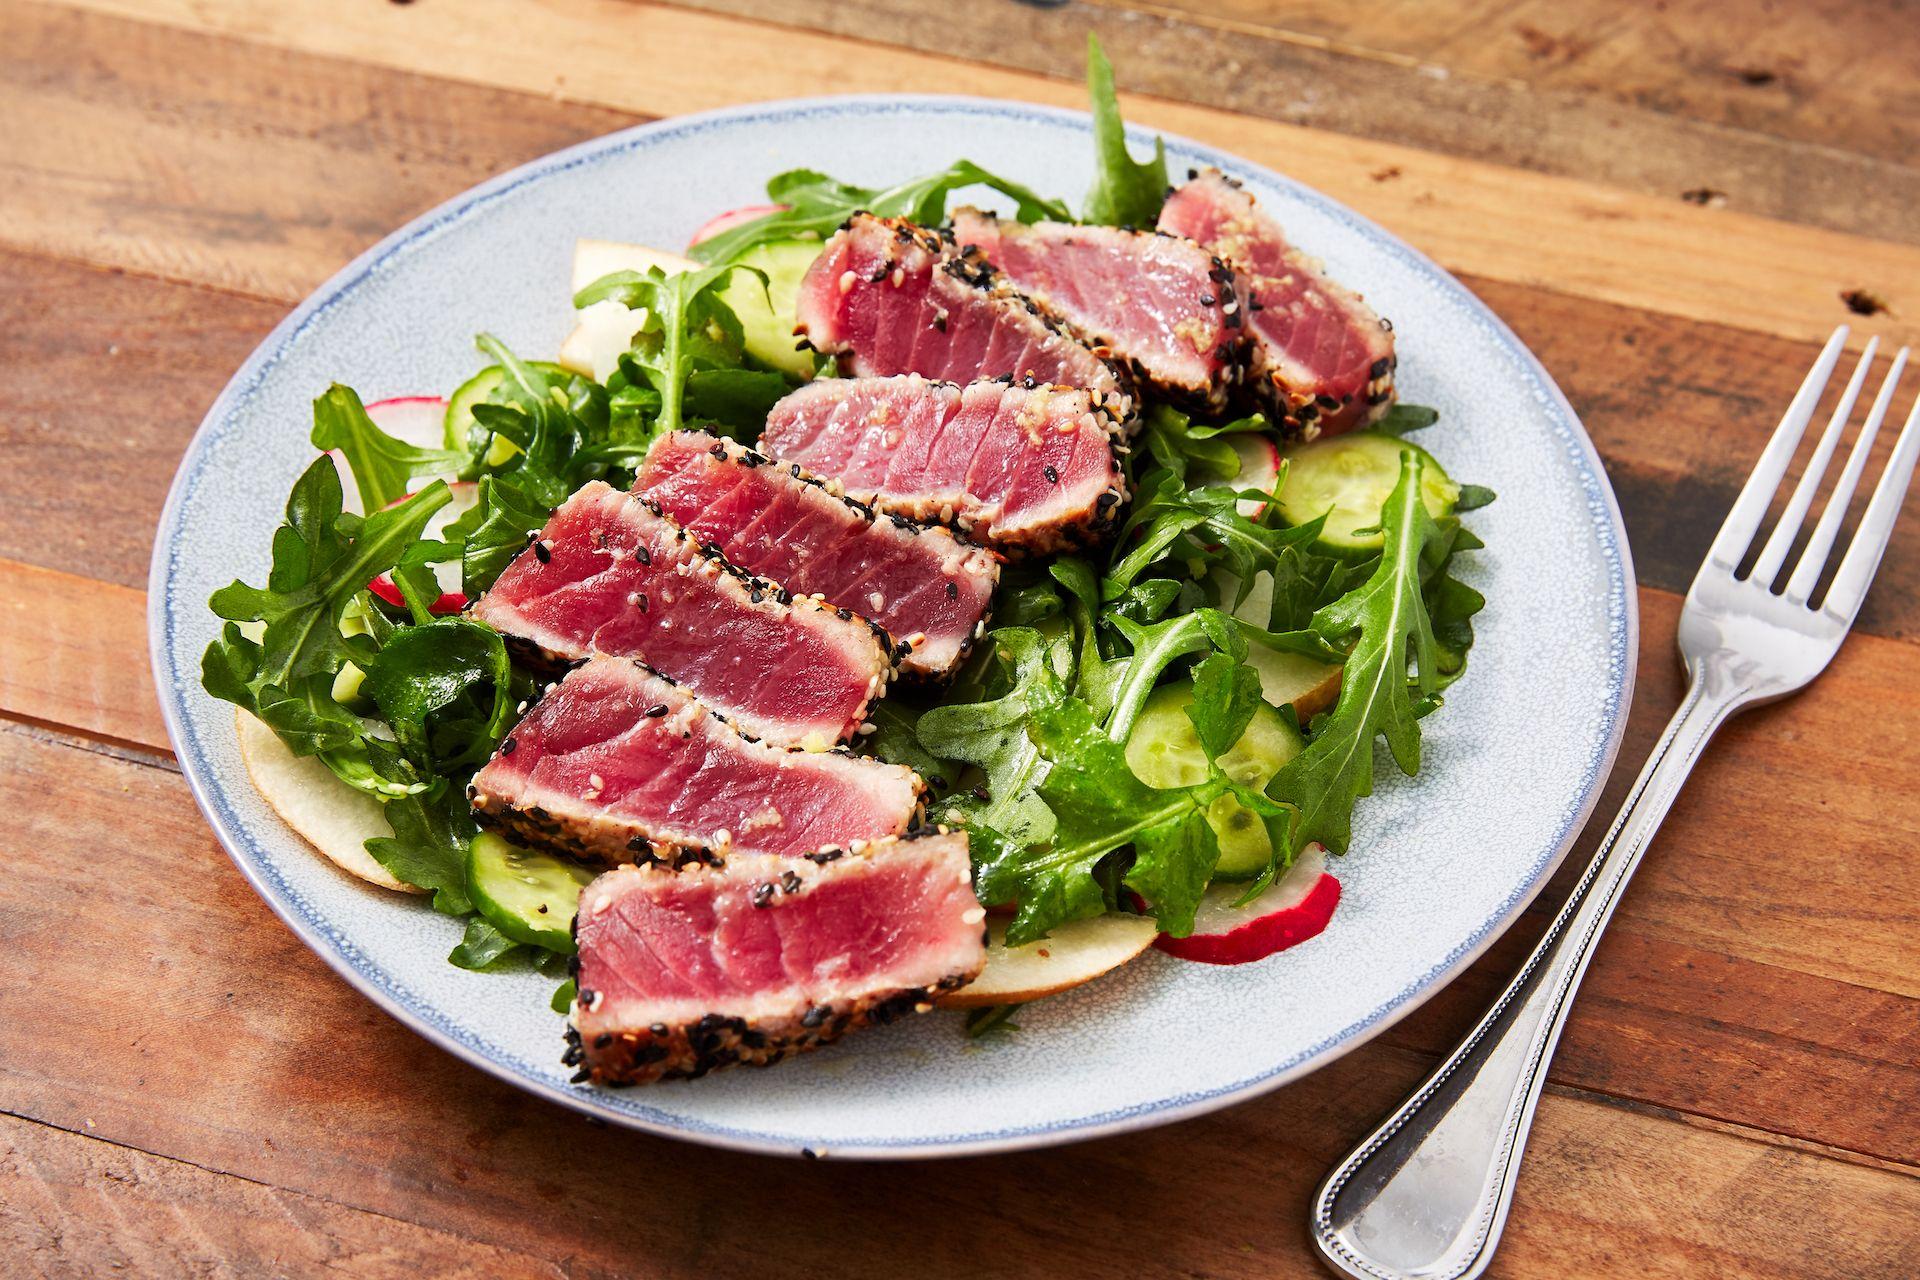 Dinner-190226-seared-tuna-435-1552085484-jpg